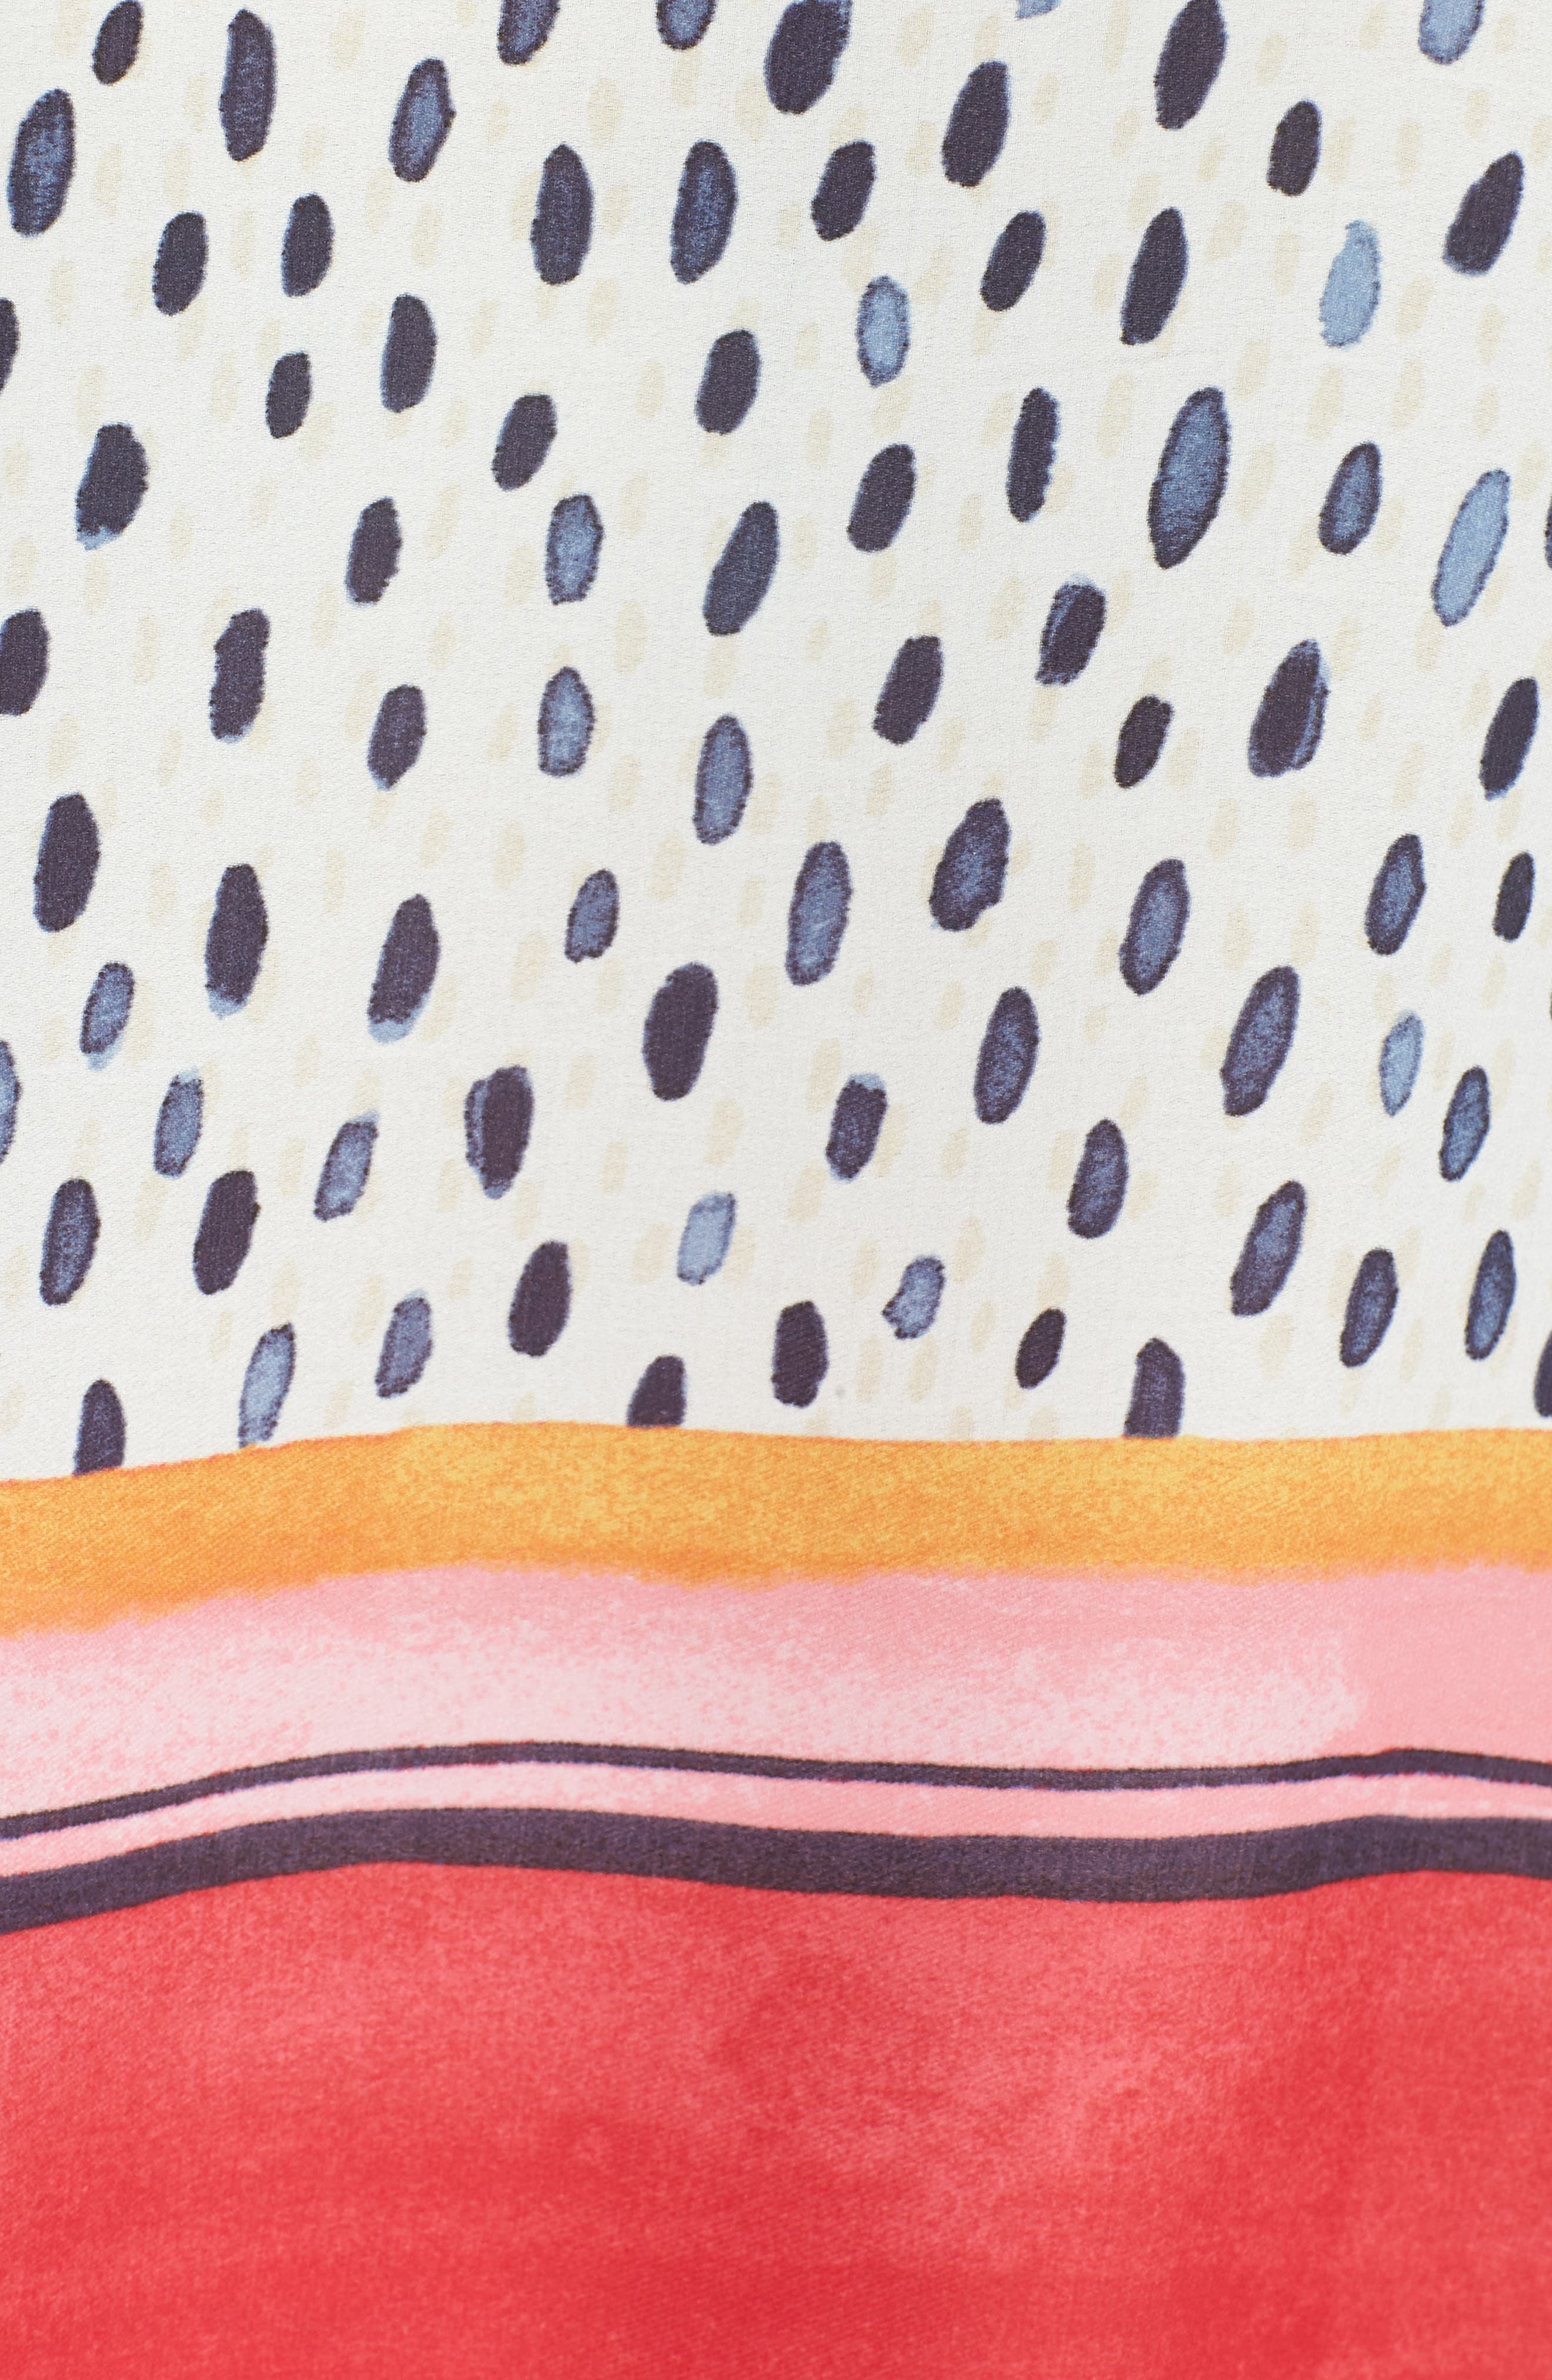 Merengue Blouse,                             Alternate thumbnail 5, color,                             Multi